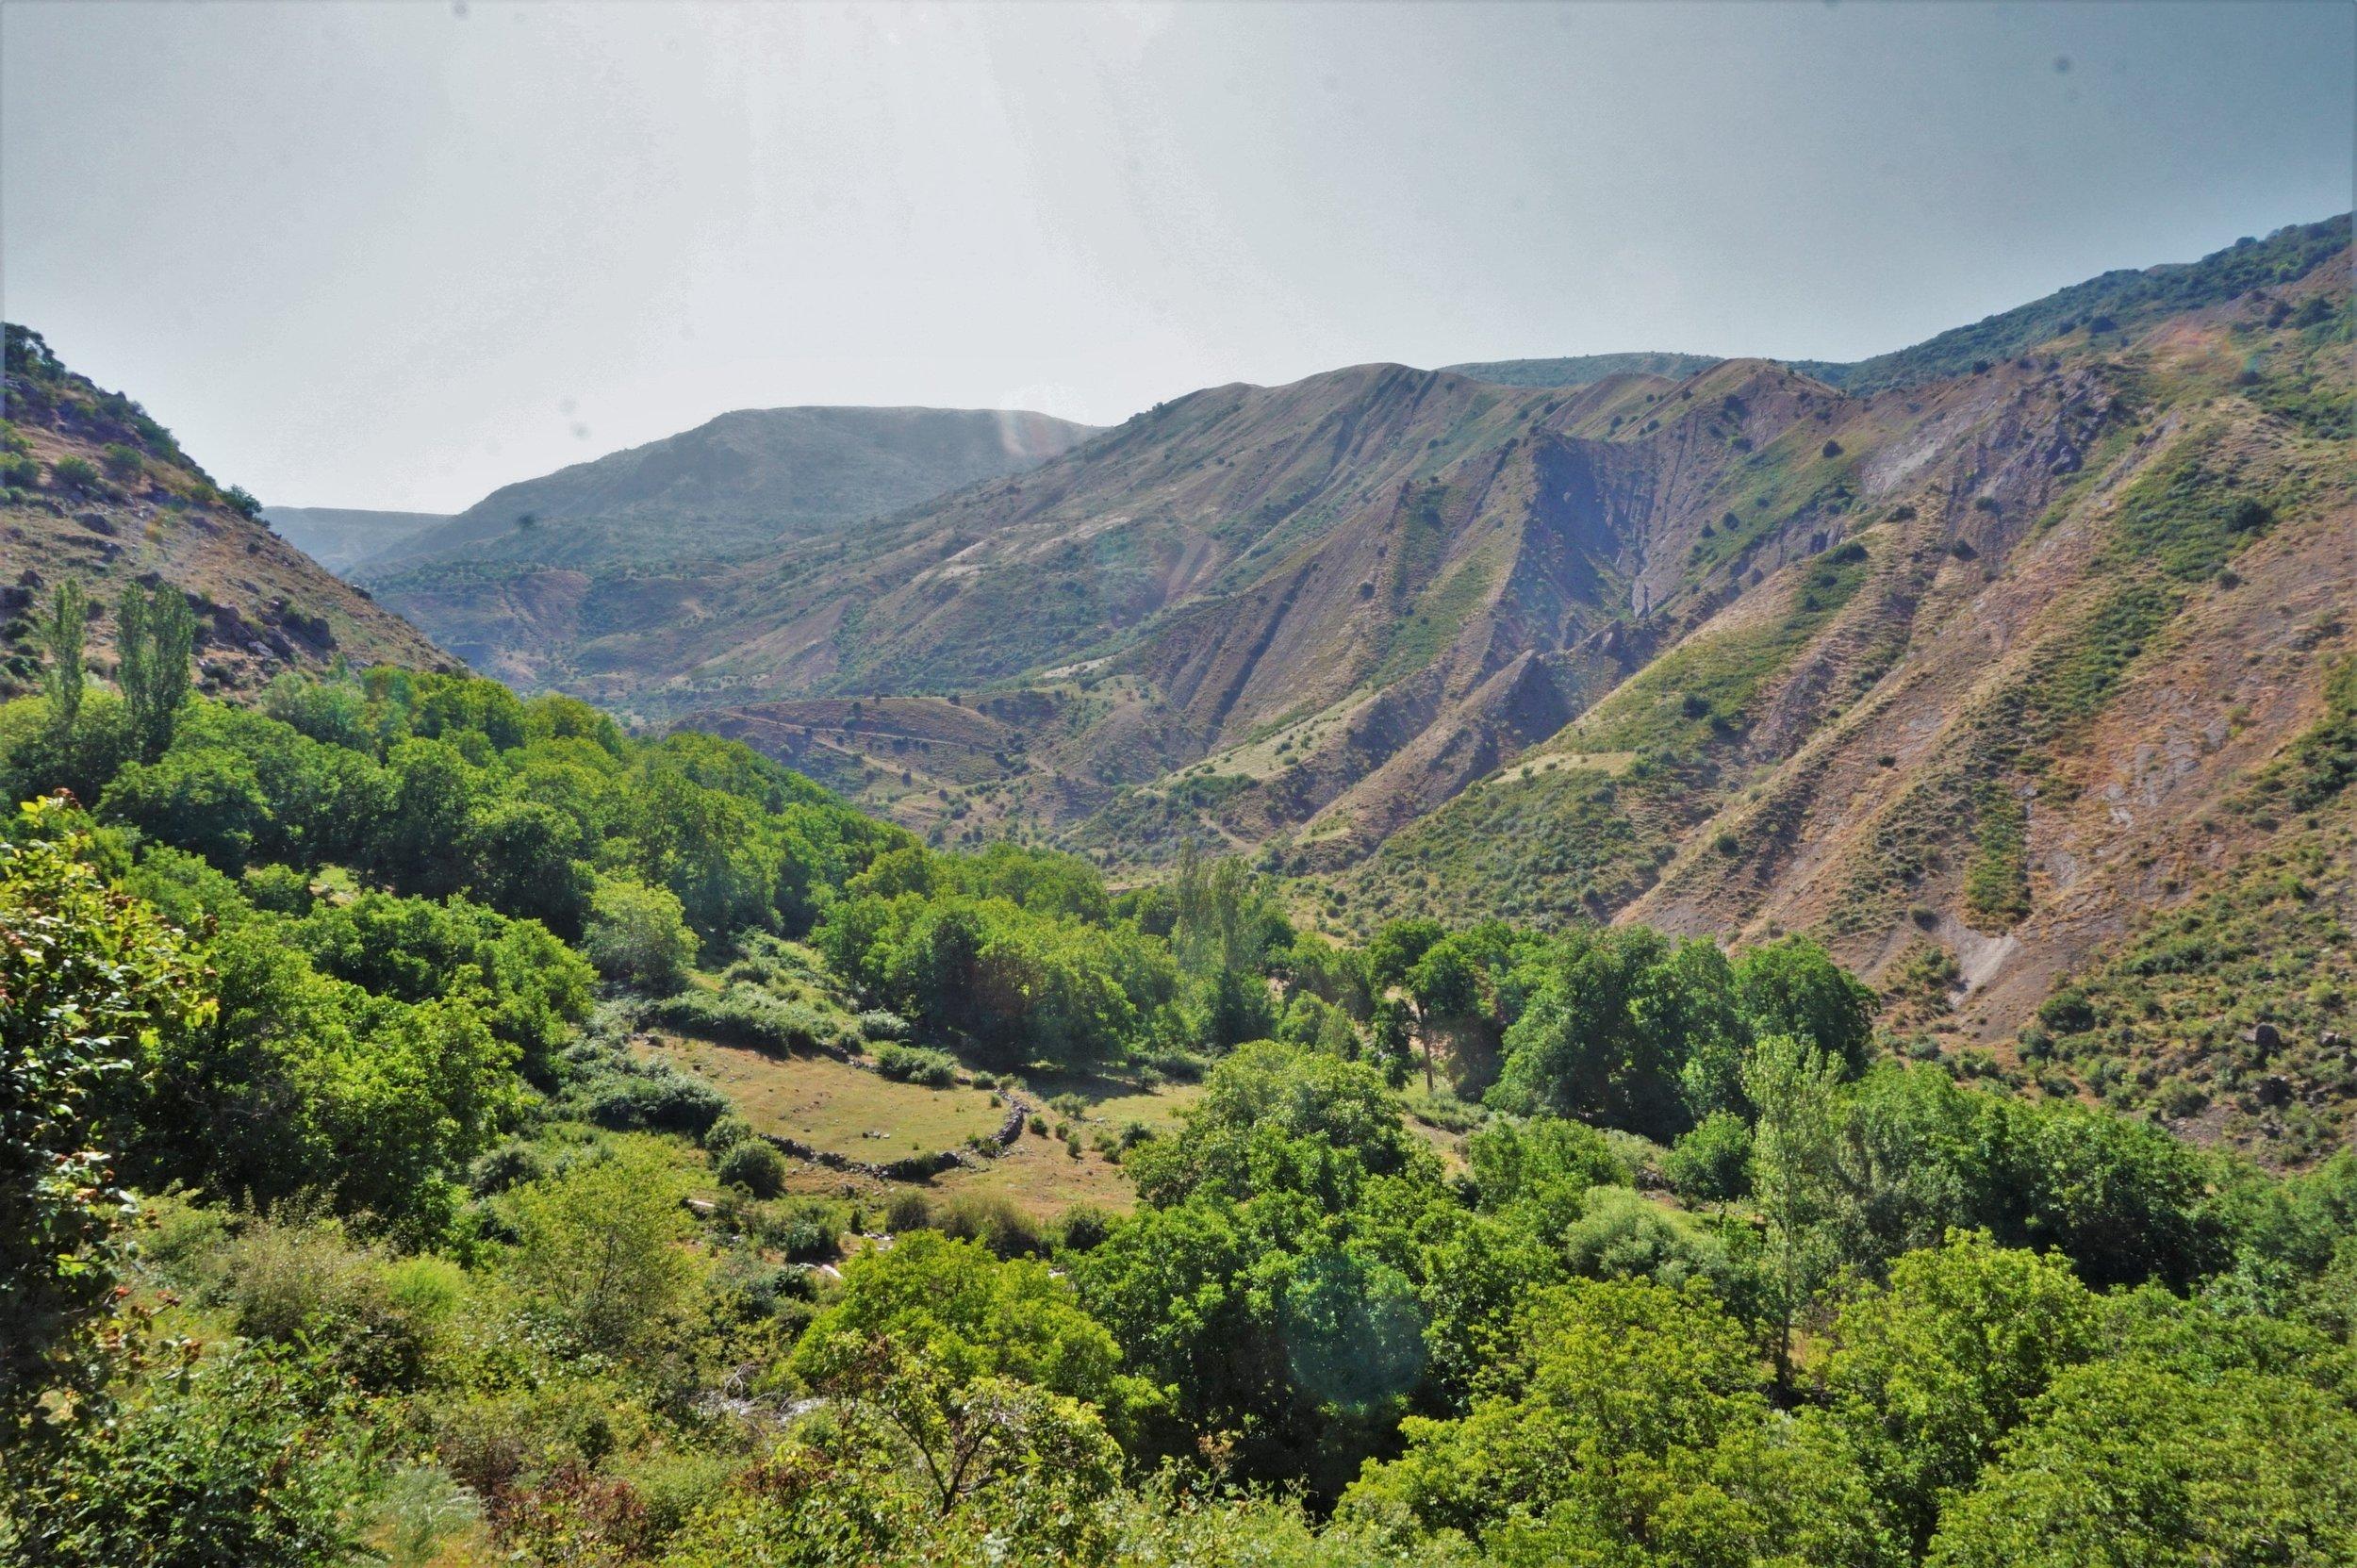 Beautiful views on a visit to Garni and Geghard.